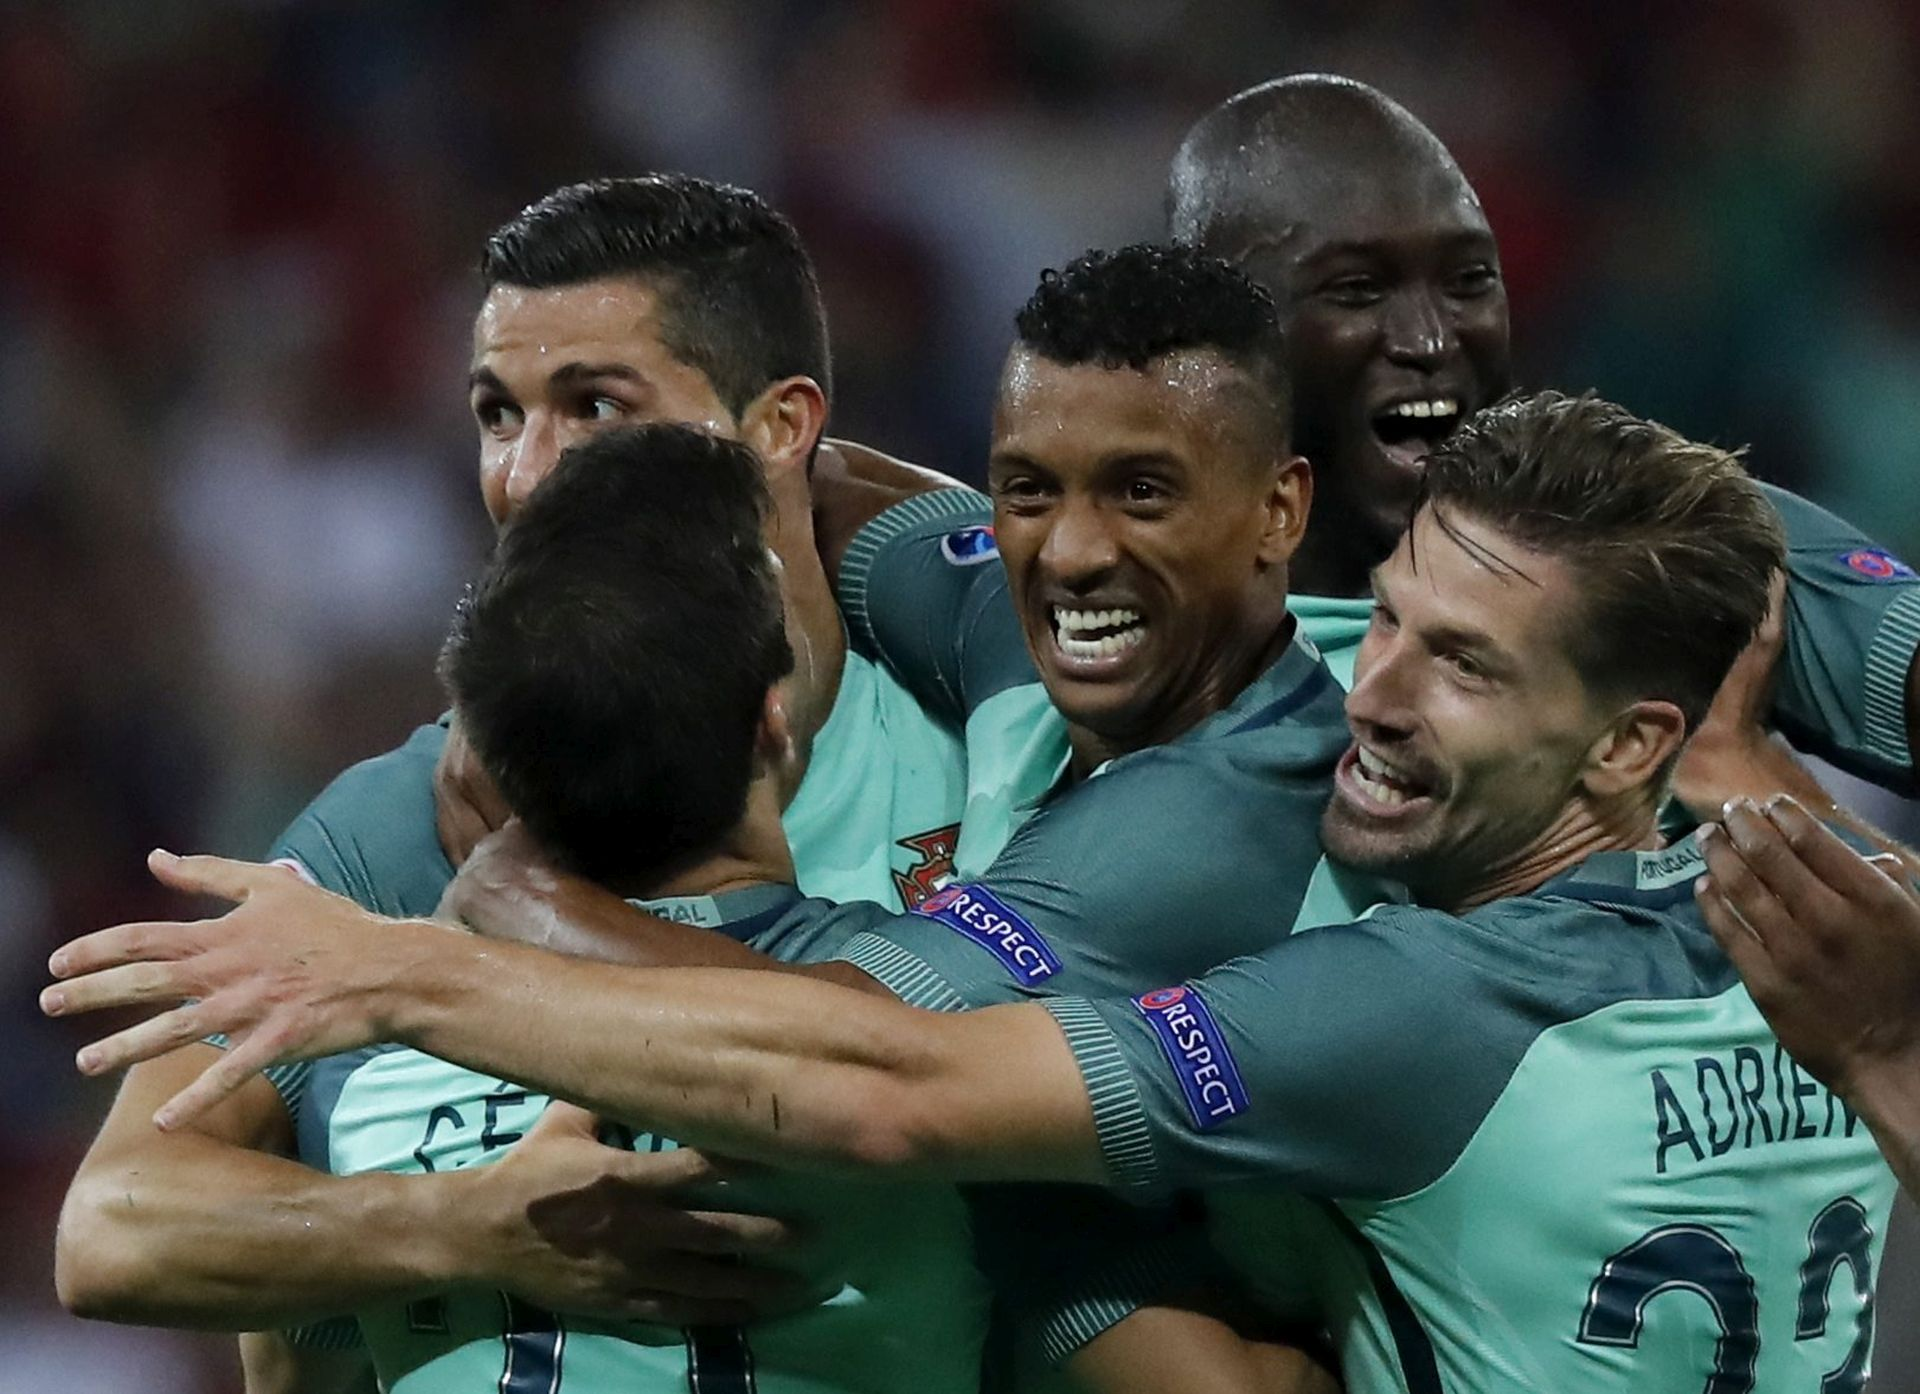 EURO 2016: Statistika utakmice Portugal – Wales (2-0)